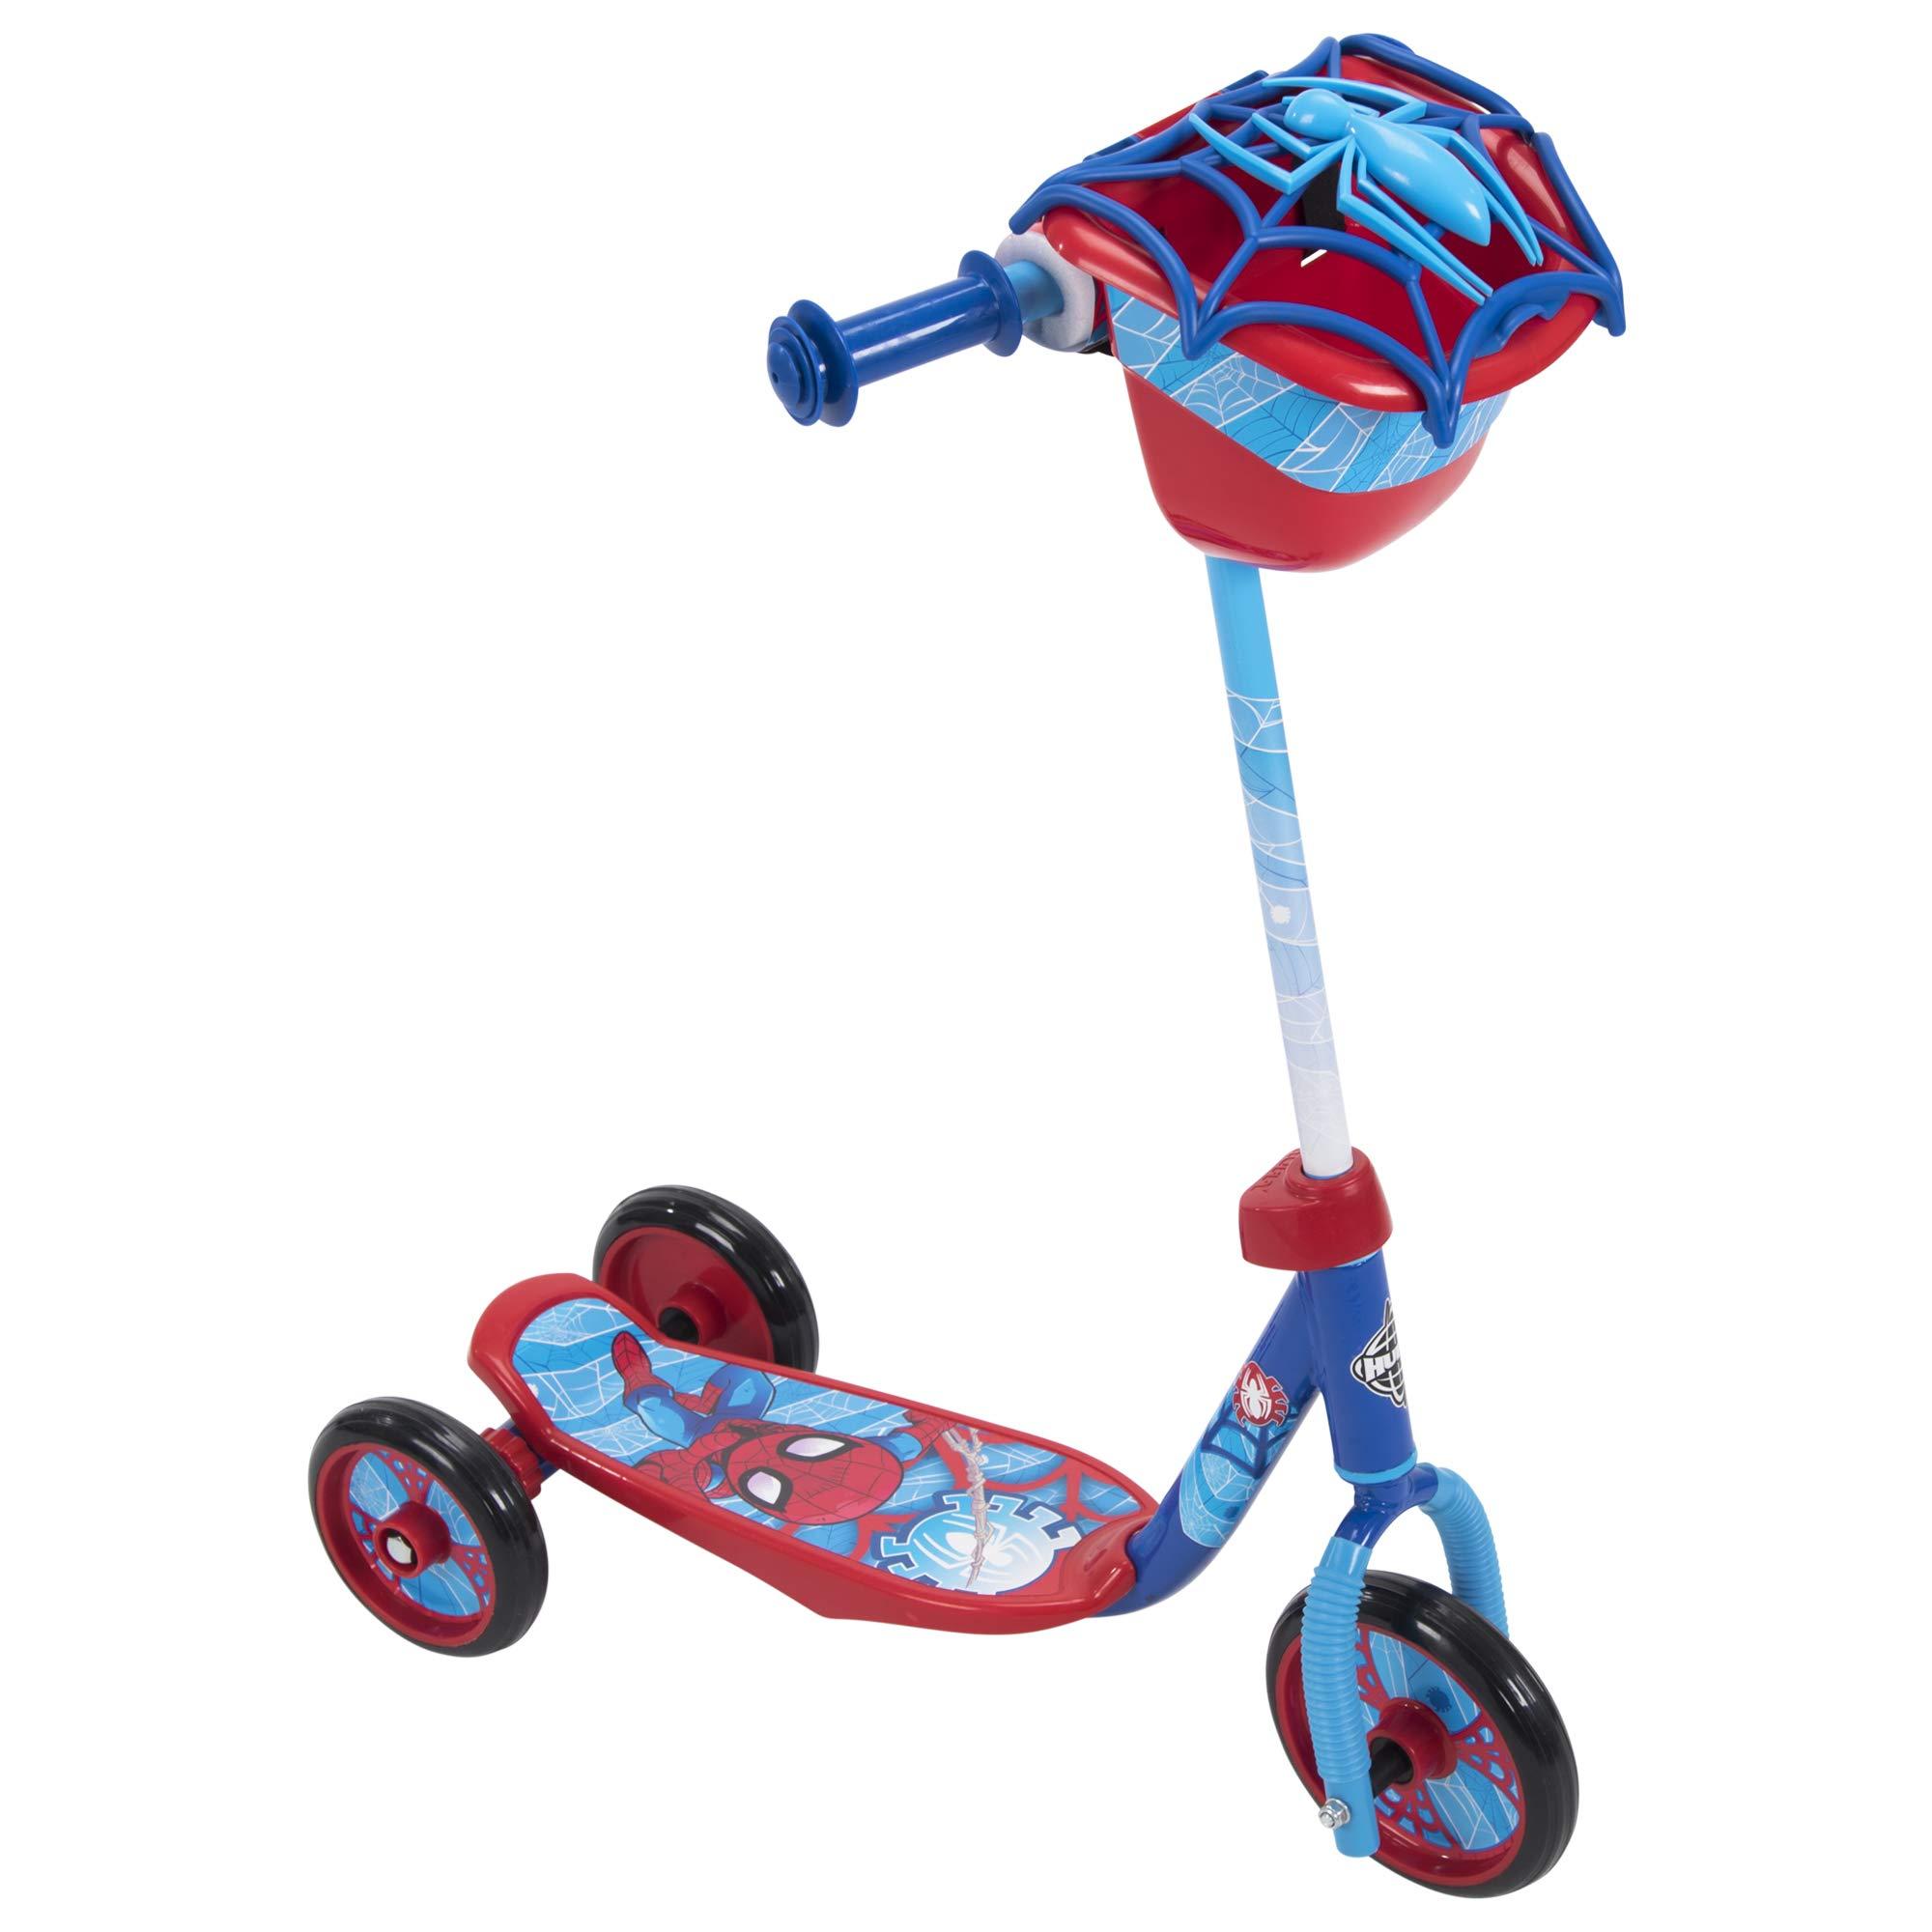 Scooter preescolar Huffy Kids para niños Disney Pixar Cars & Toy Story, Star Wars, Marvel Spider-Man, juguete de 3 ruedas